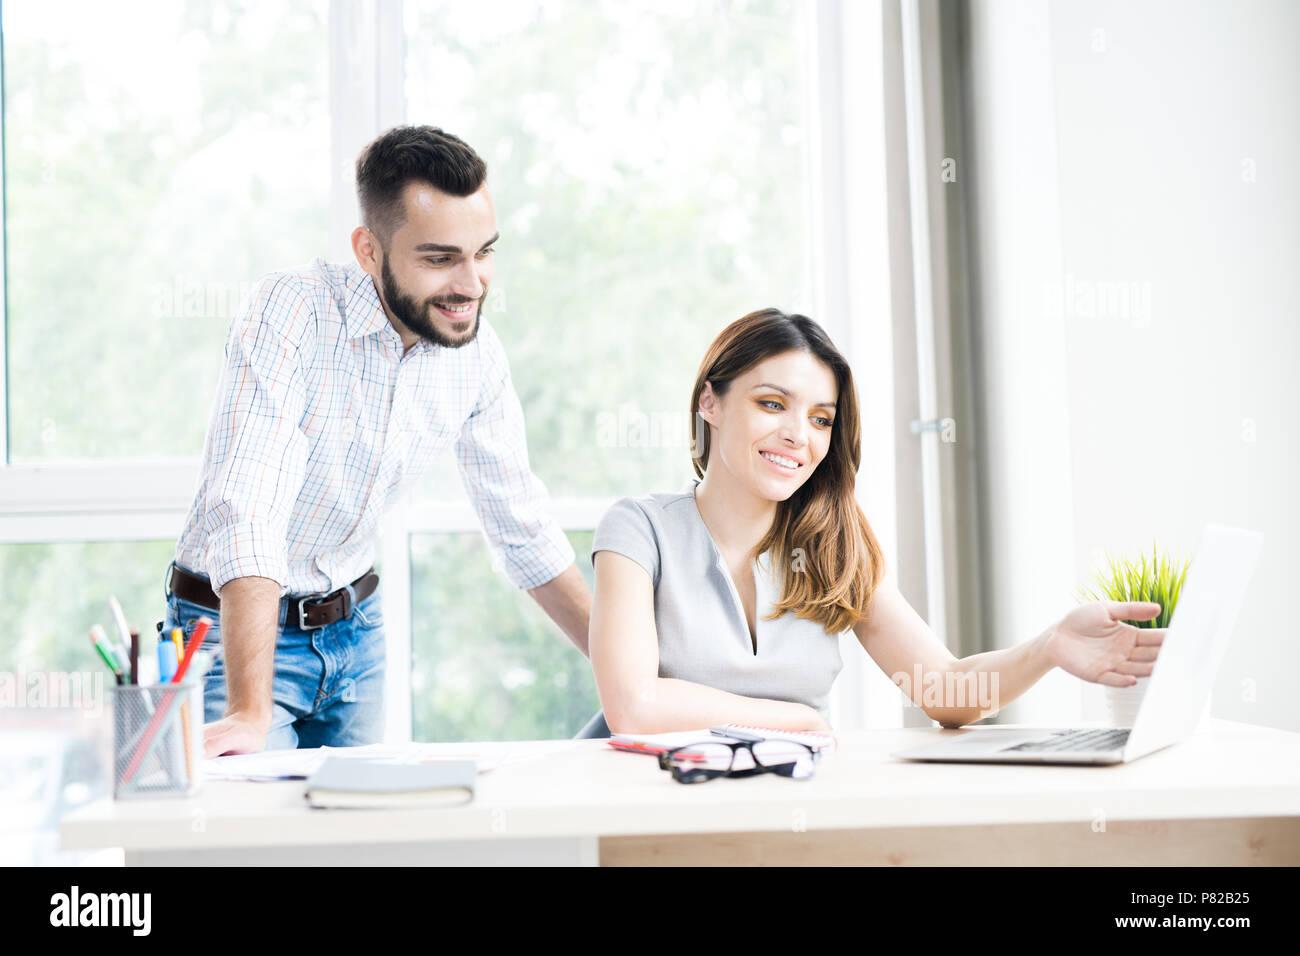 Zwei moderne Geschäftsleute im Büro Stockbild